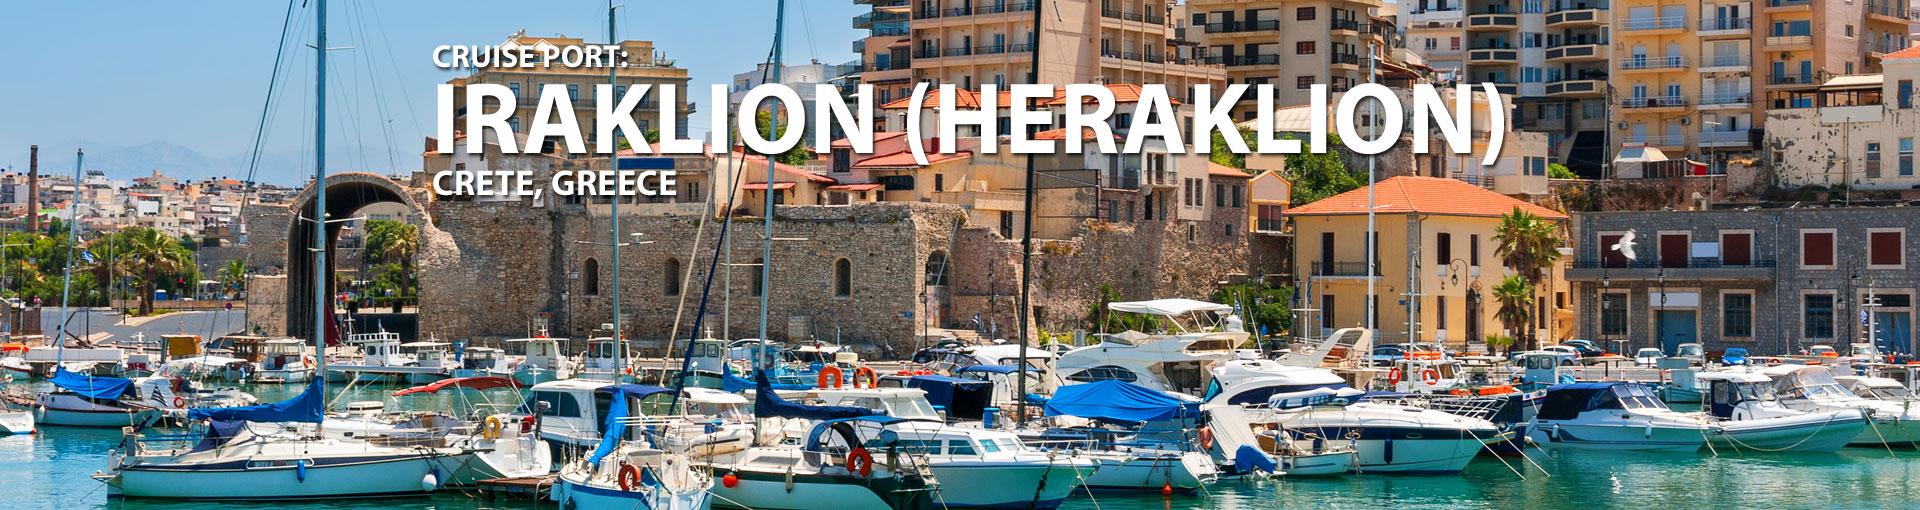 Cruises to Iraklion (Heraklion), Crete, Greece